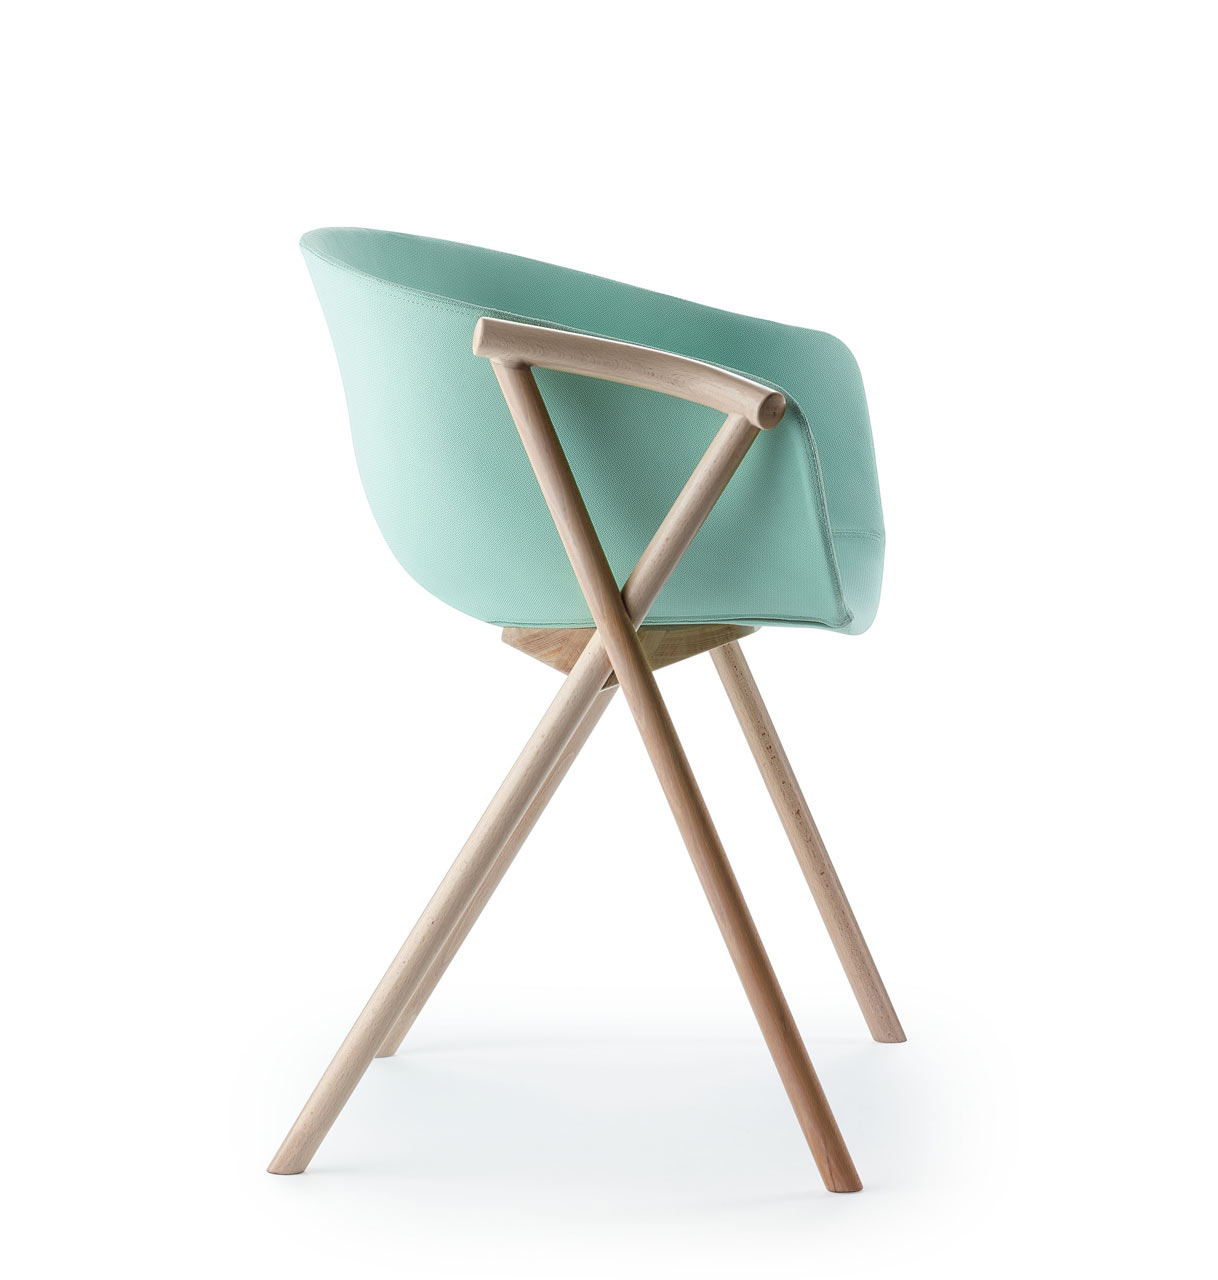 Bai-Chair-Ondarreta-Ander-Lizaso-2